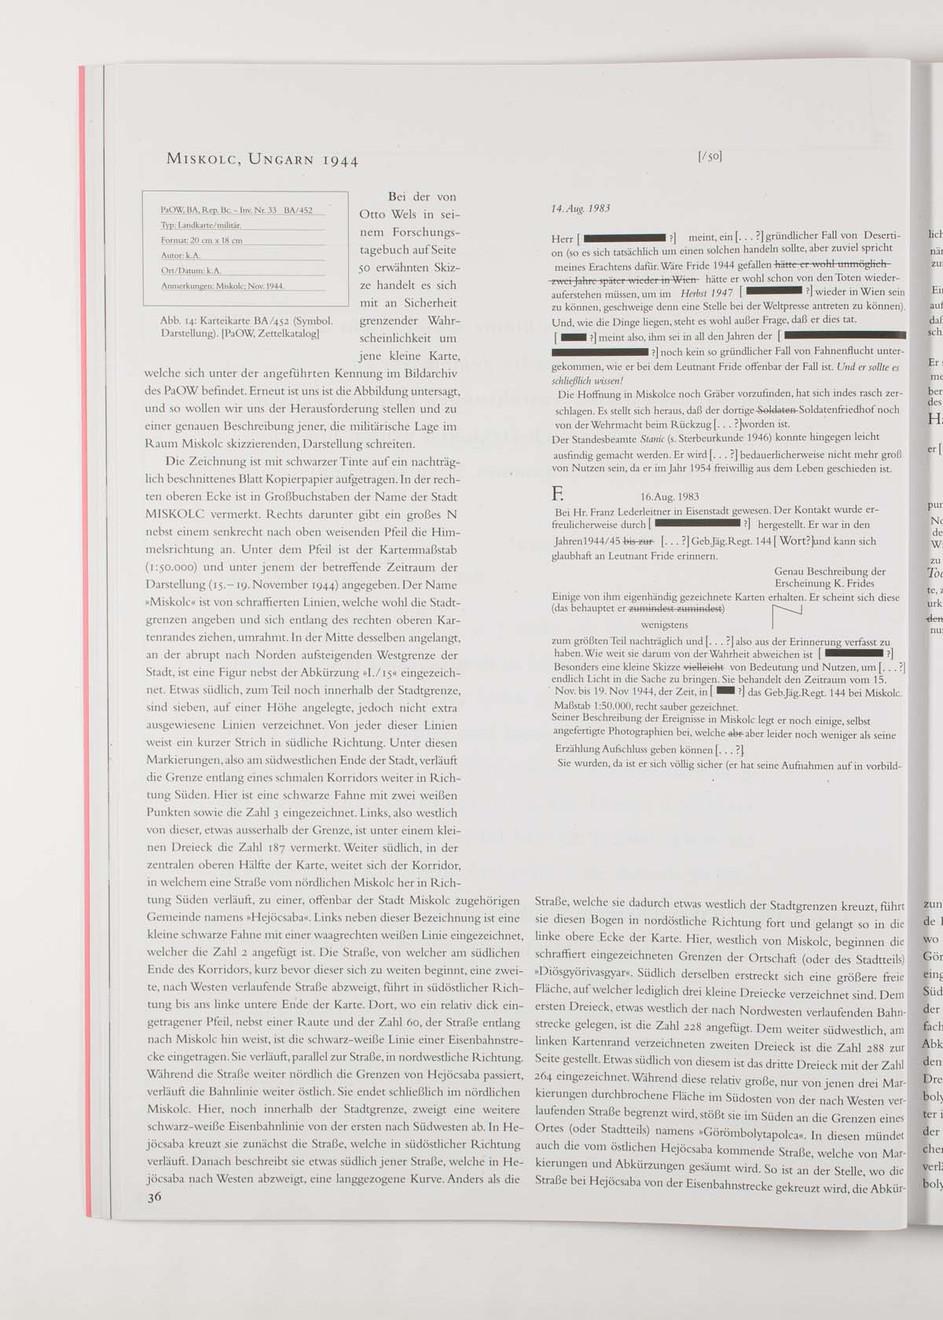 190910Zirkel_web_links2_001.jpg